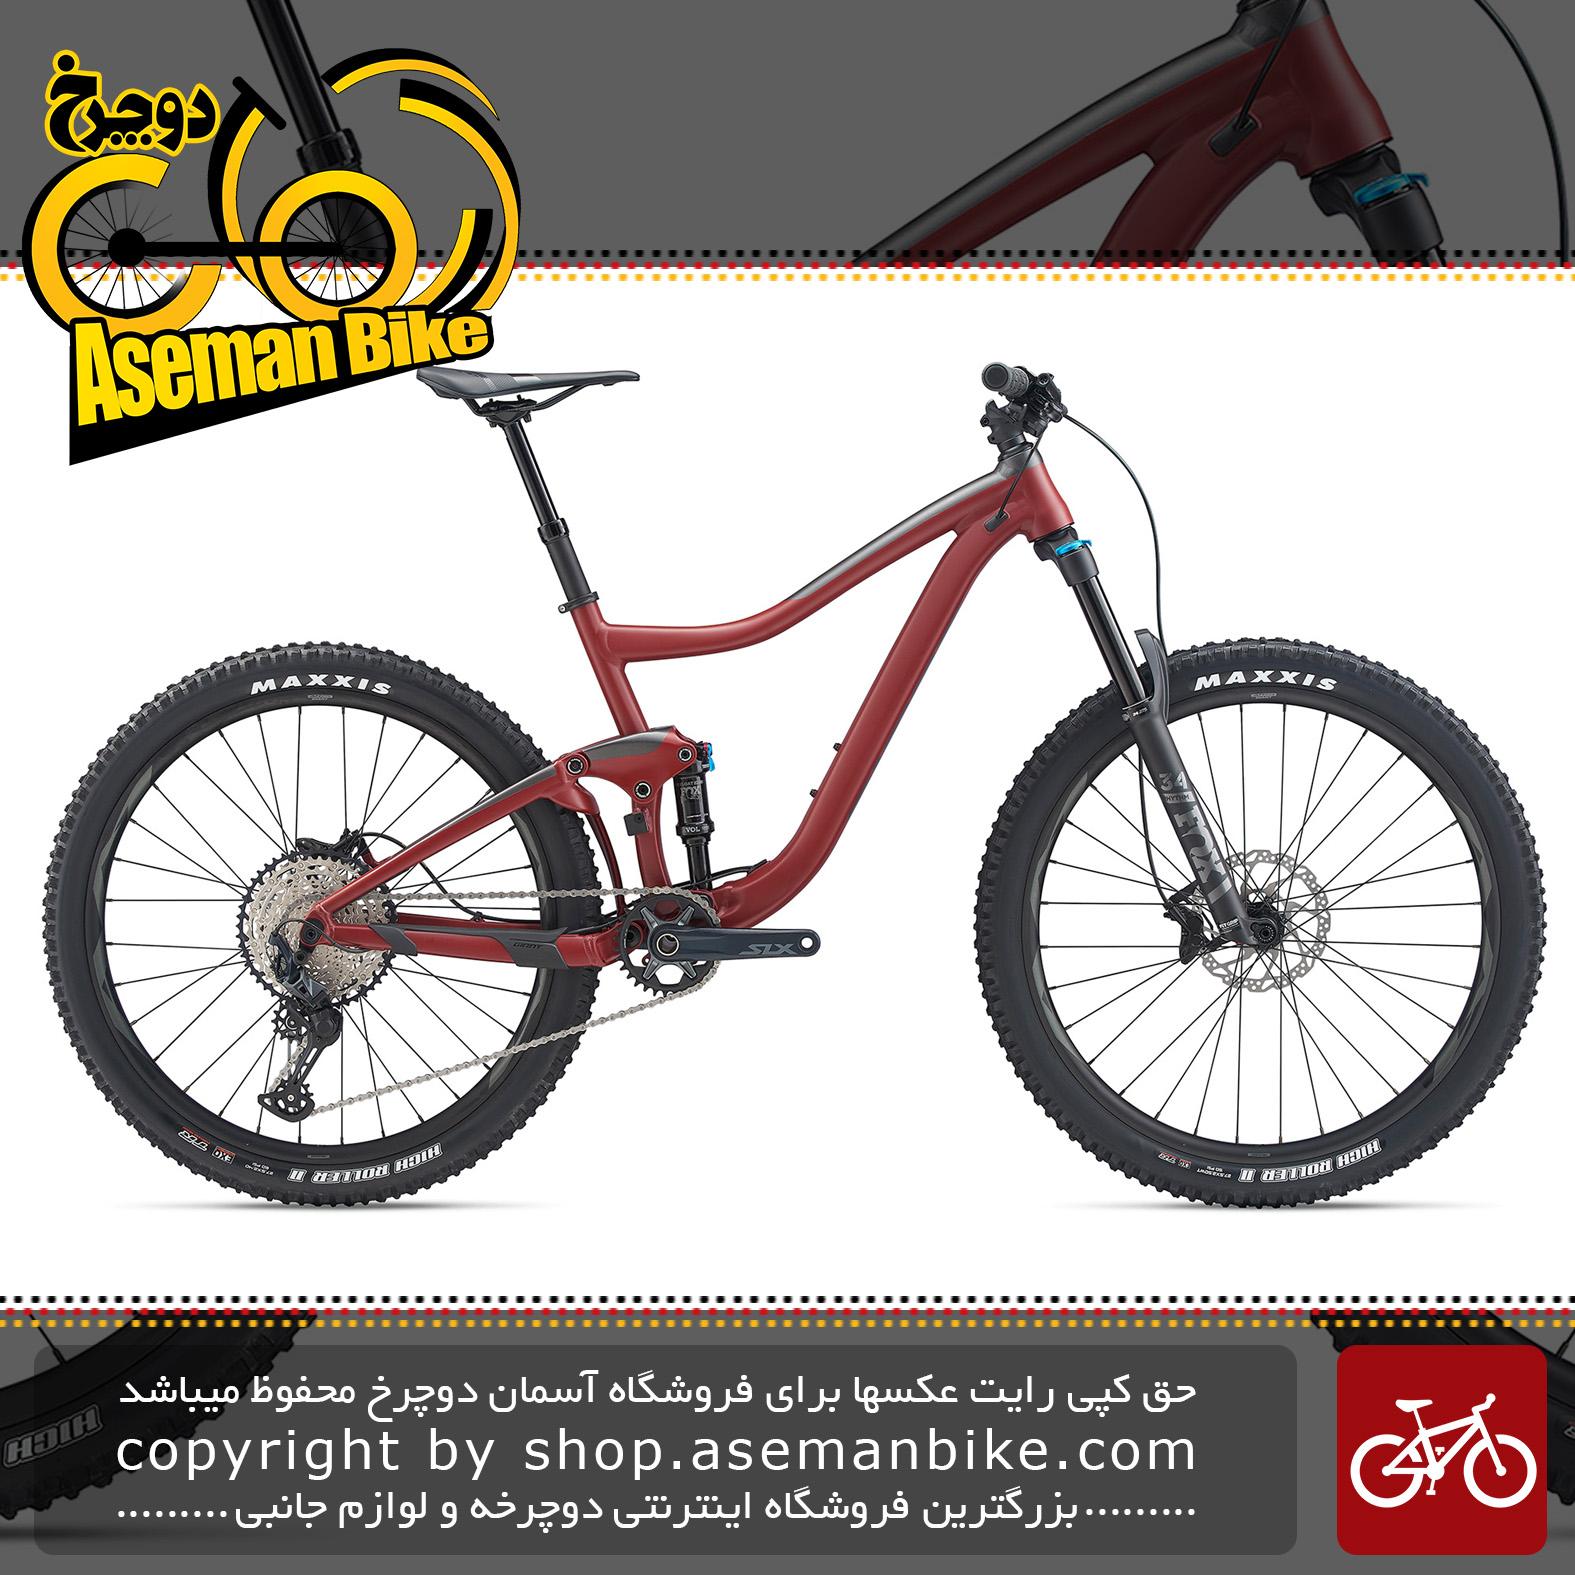 دوچرخه کوهستان جاینت مدل ترنس 2 2020 Giant Mountain Bicycle Trance 2 2020